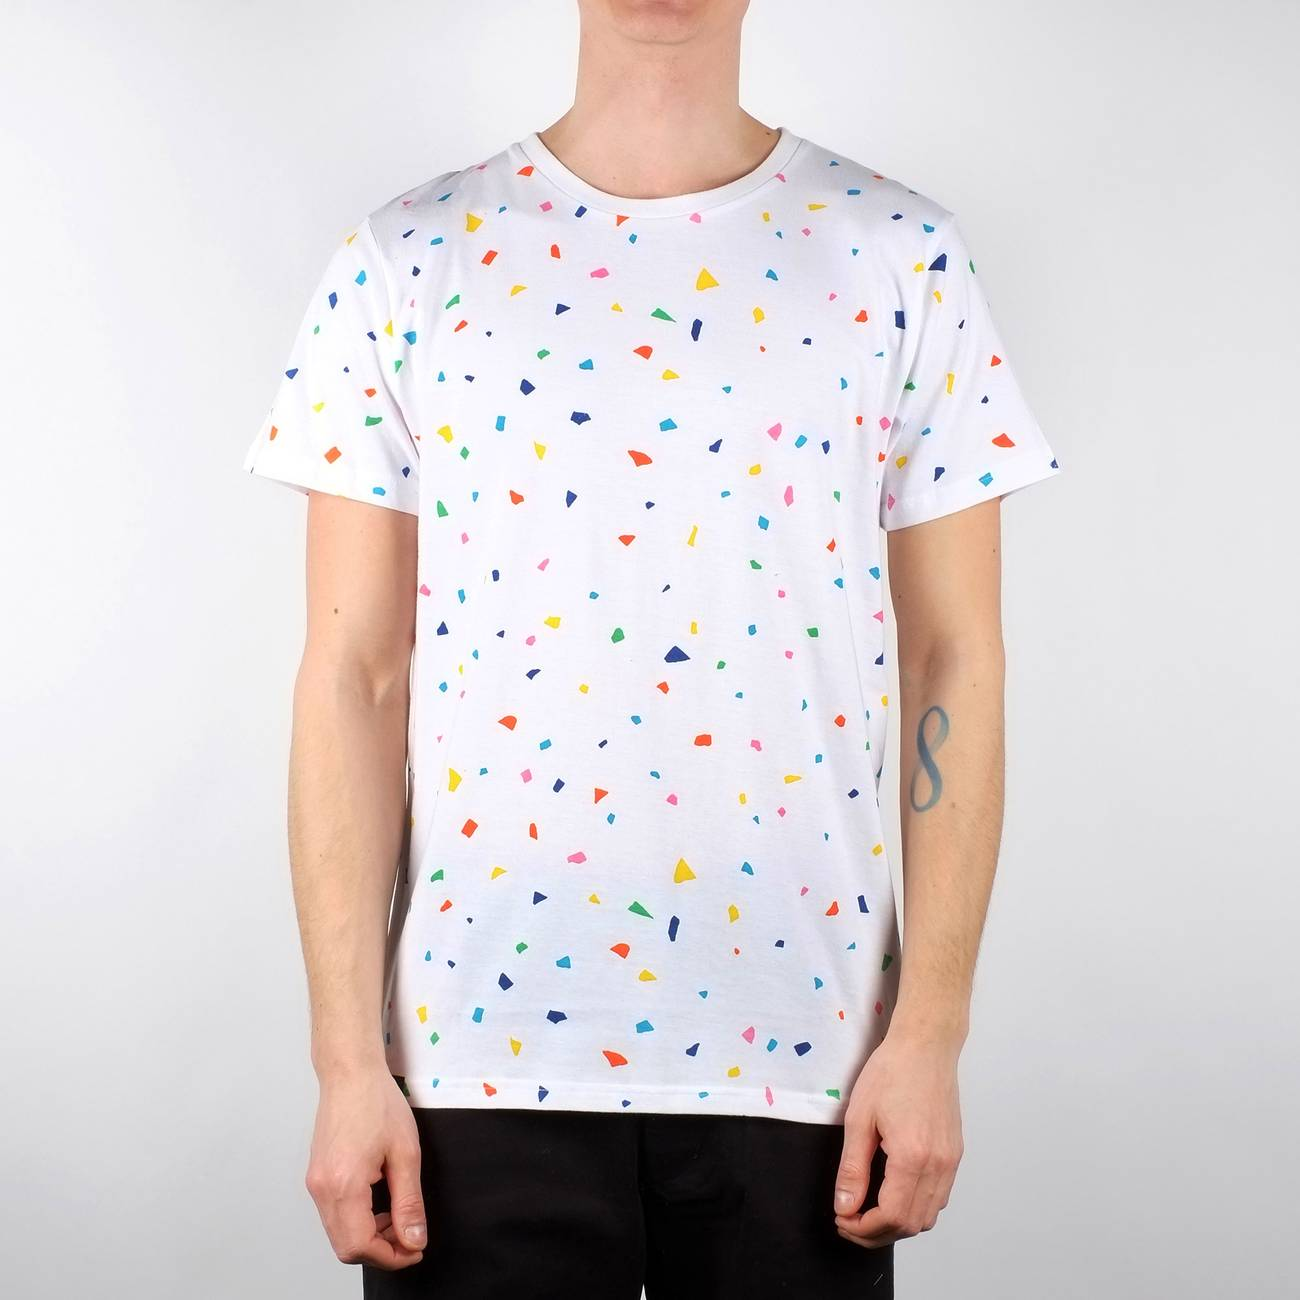 Stockholm T-shirt Confetti